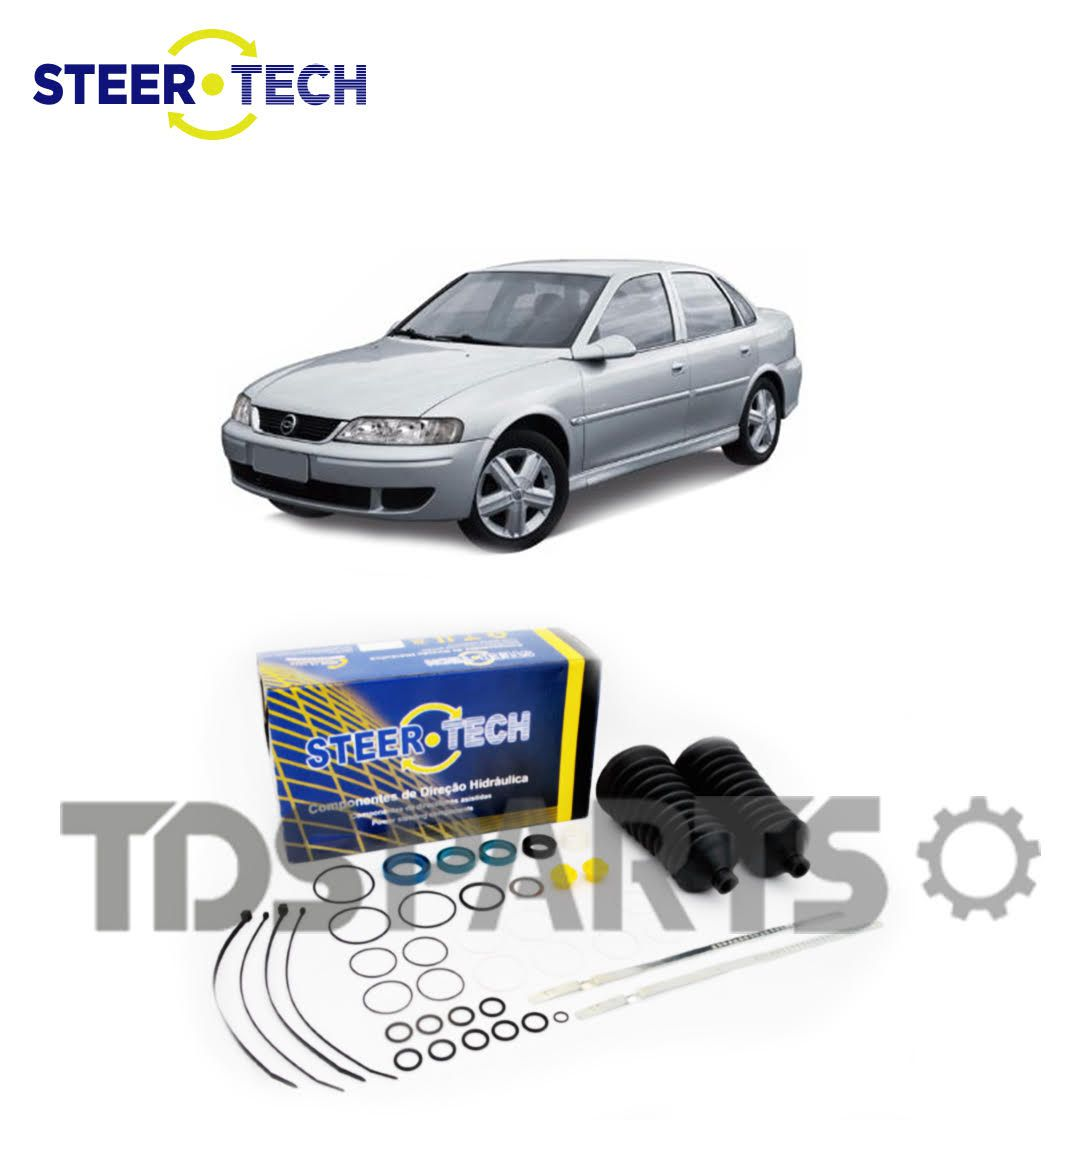 Reparo Caixa de Direção Hidráulica Chevrolet Vectra - Caixa DHB